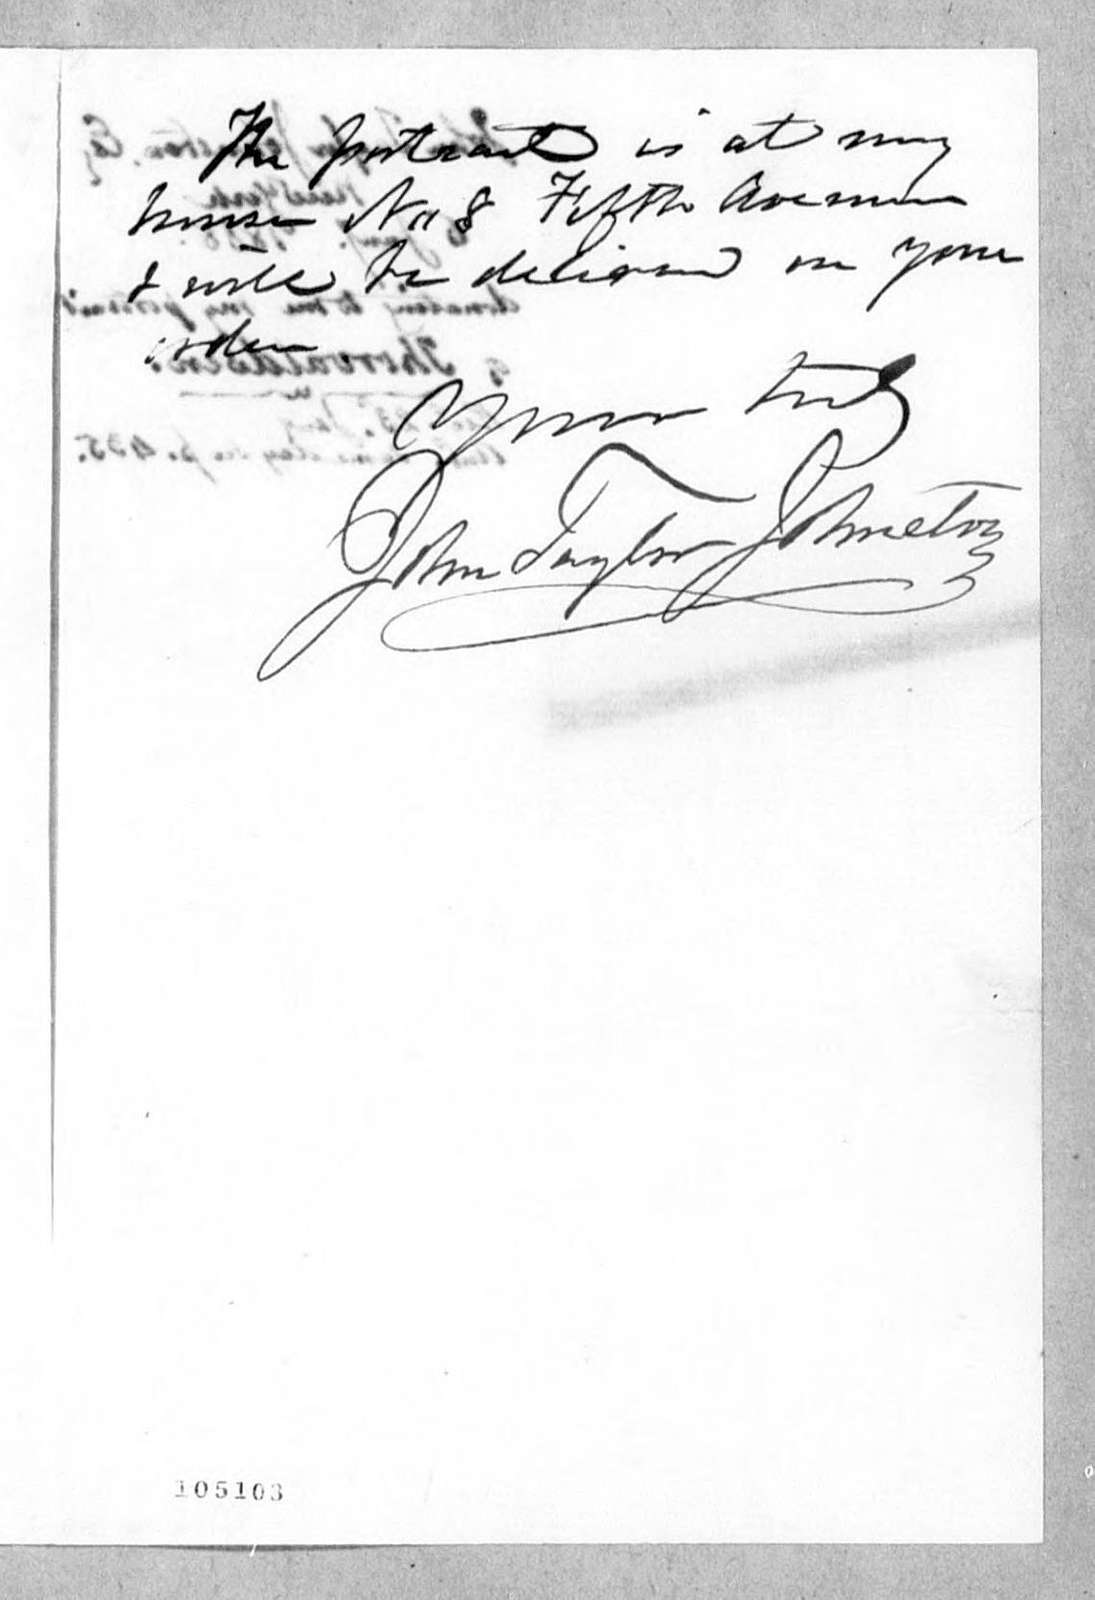 Bound volume---6 January 1868-2 June 1869